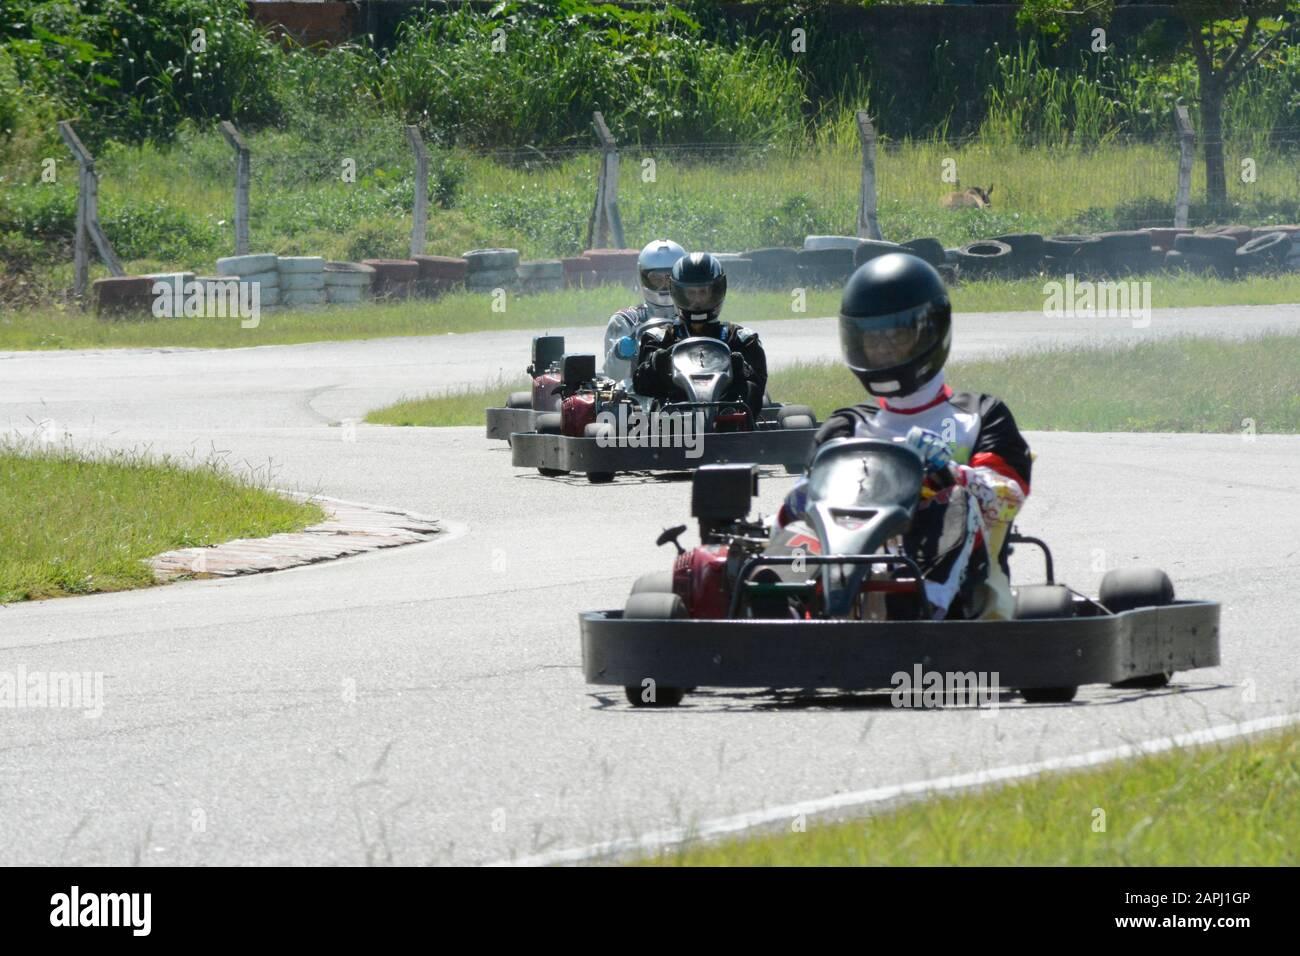 Florianopolis - Brasile, 9 febbraio 2019: Piloti sconosciuti in competizione nel Karting Championship. I piloti in karts indossando casco, racing suit partecipare Foto Stock